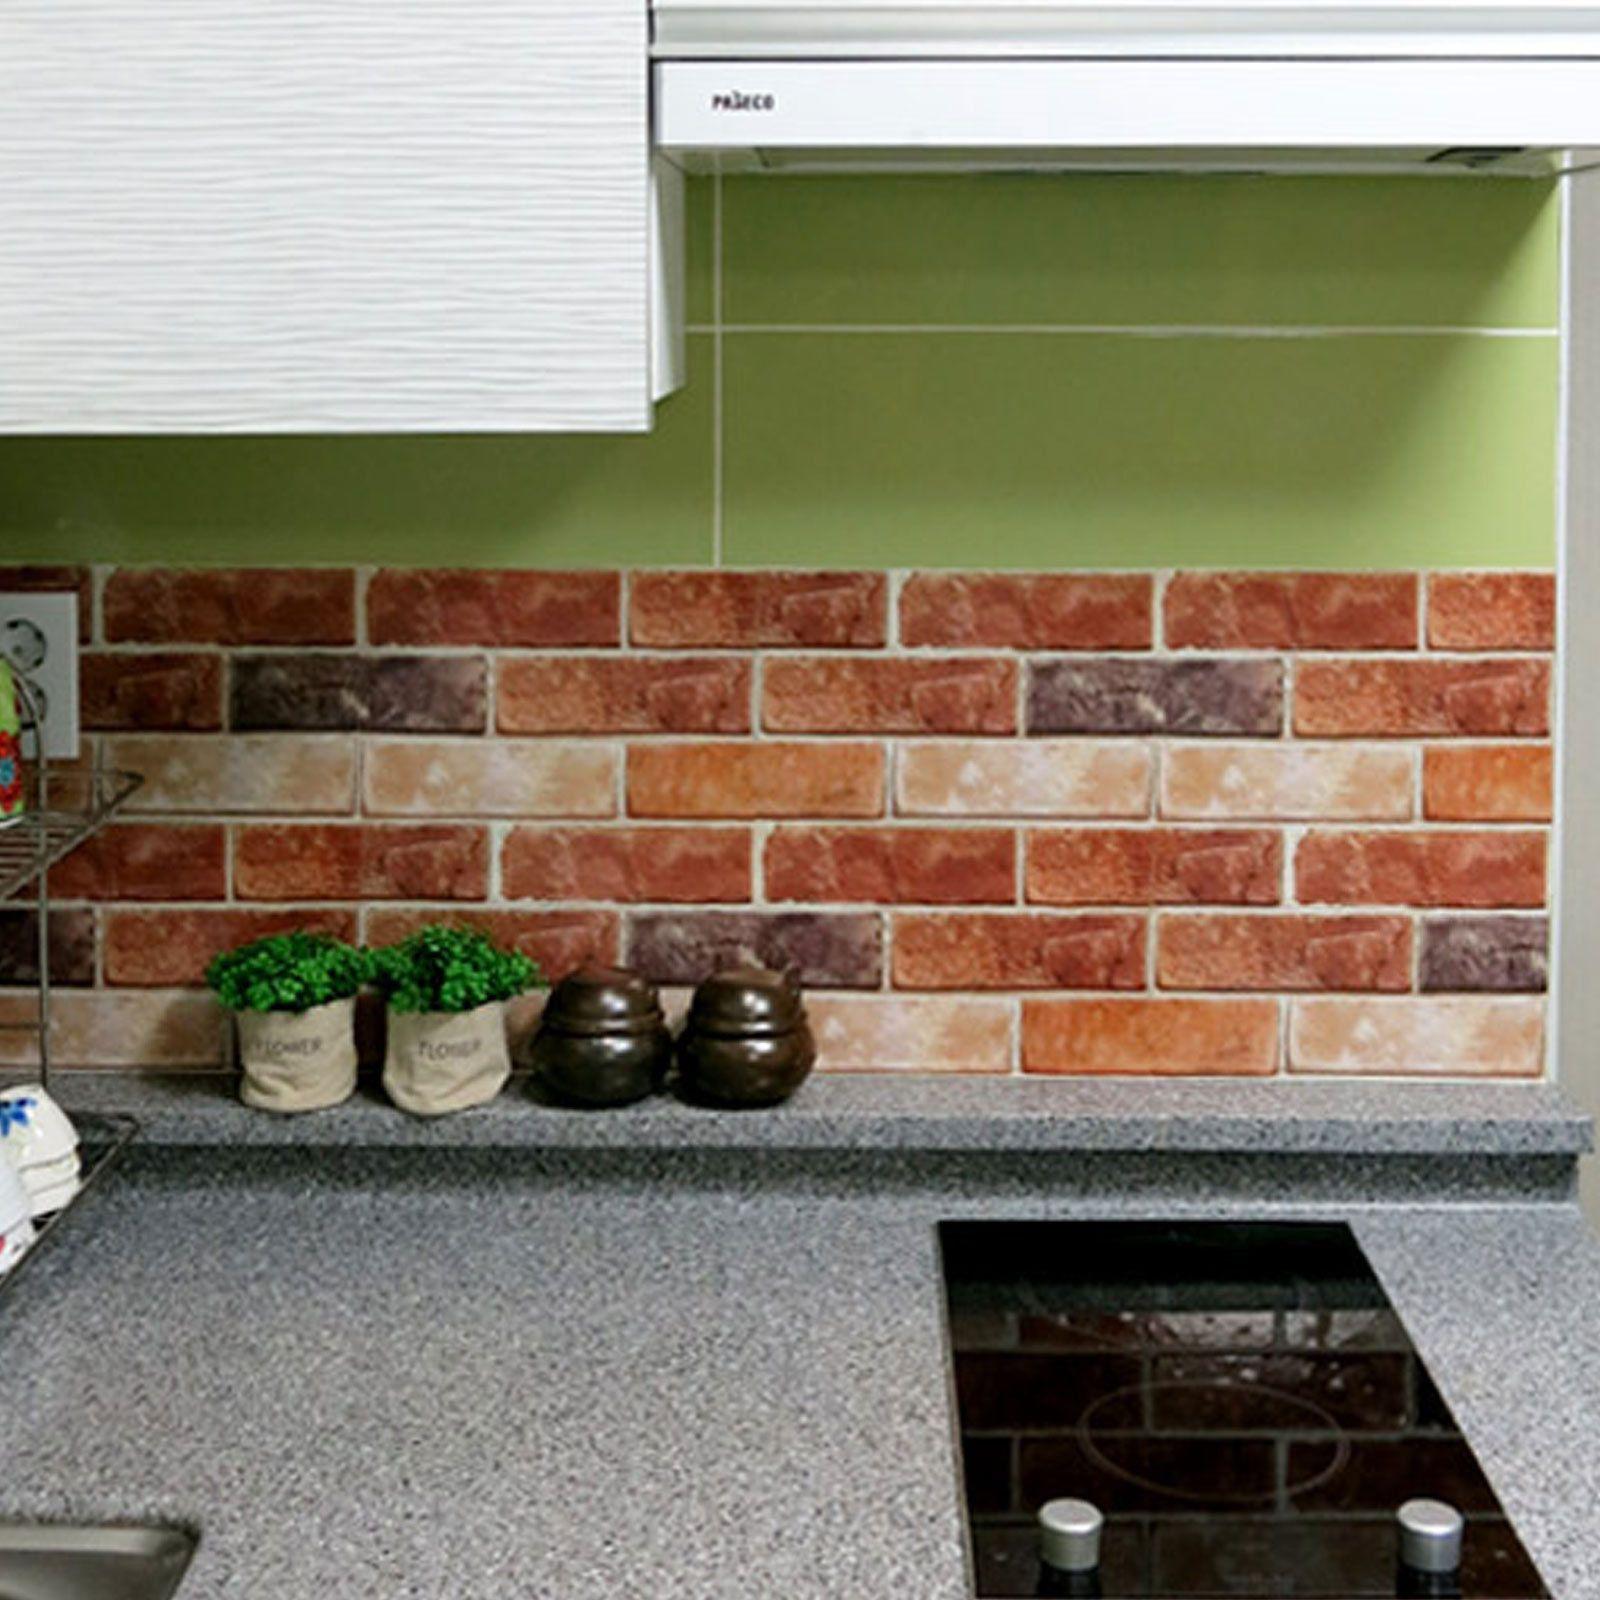 Brick Effect Tile Stickers Home Decor Kitchen Bathroom Wall DIY Wallpaper  Table Art. Home Decor Mosaic Tile Sticker. No Tools And No Wallpaper Paste  ...